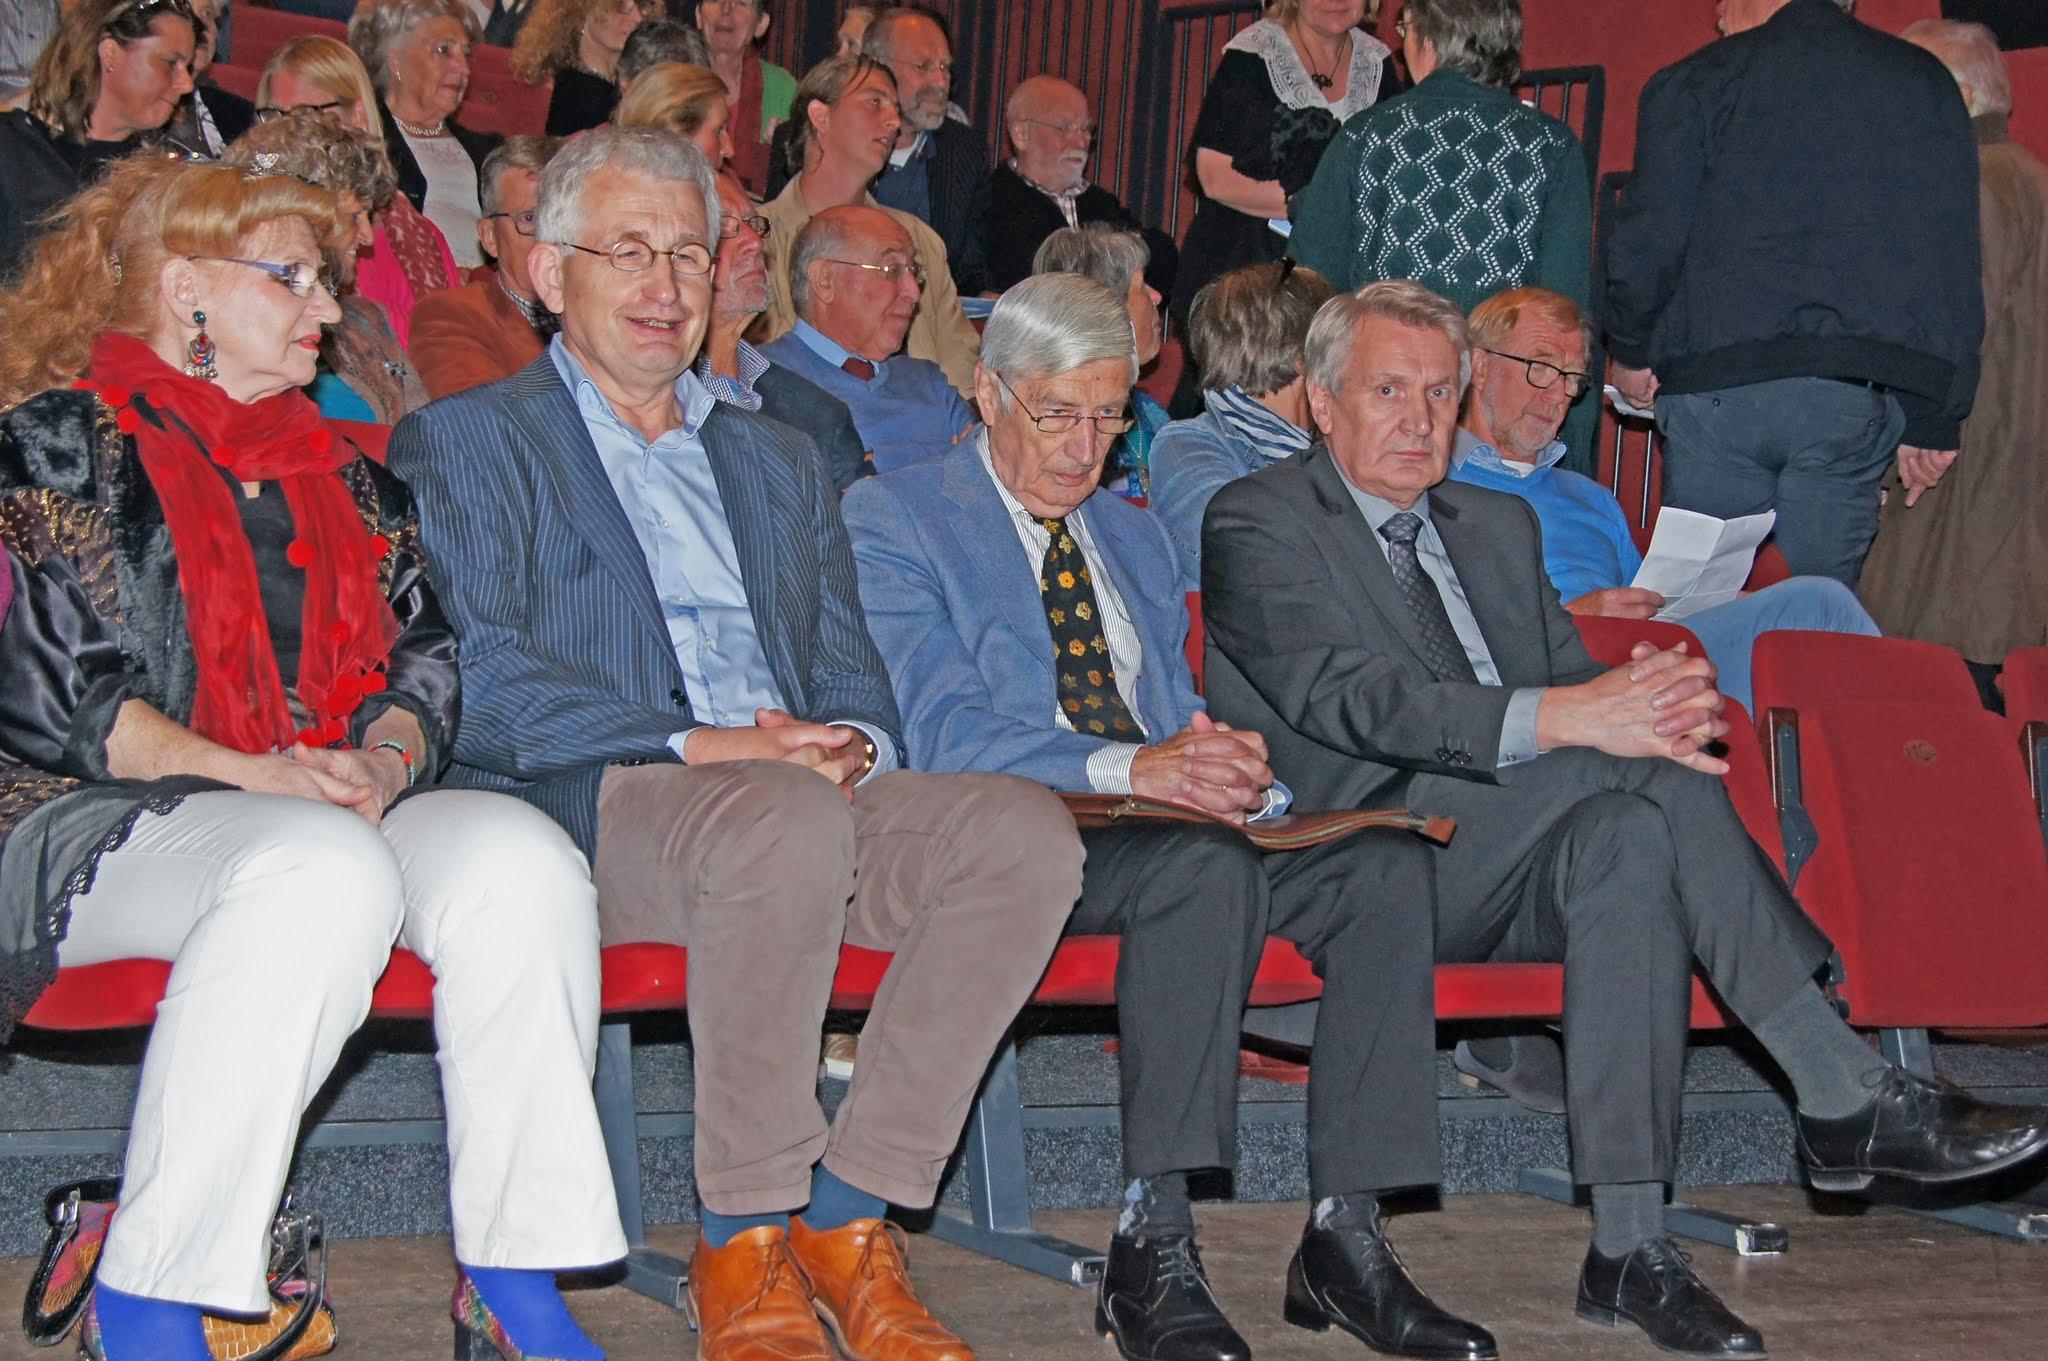 Henri Veldhuis zit naast Dries van Agt en Ingrid Rollema tijdens de filmmiddag van de werkgroep in Culemborg